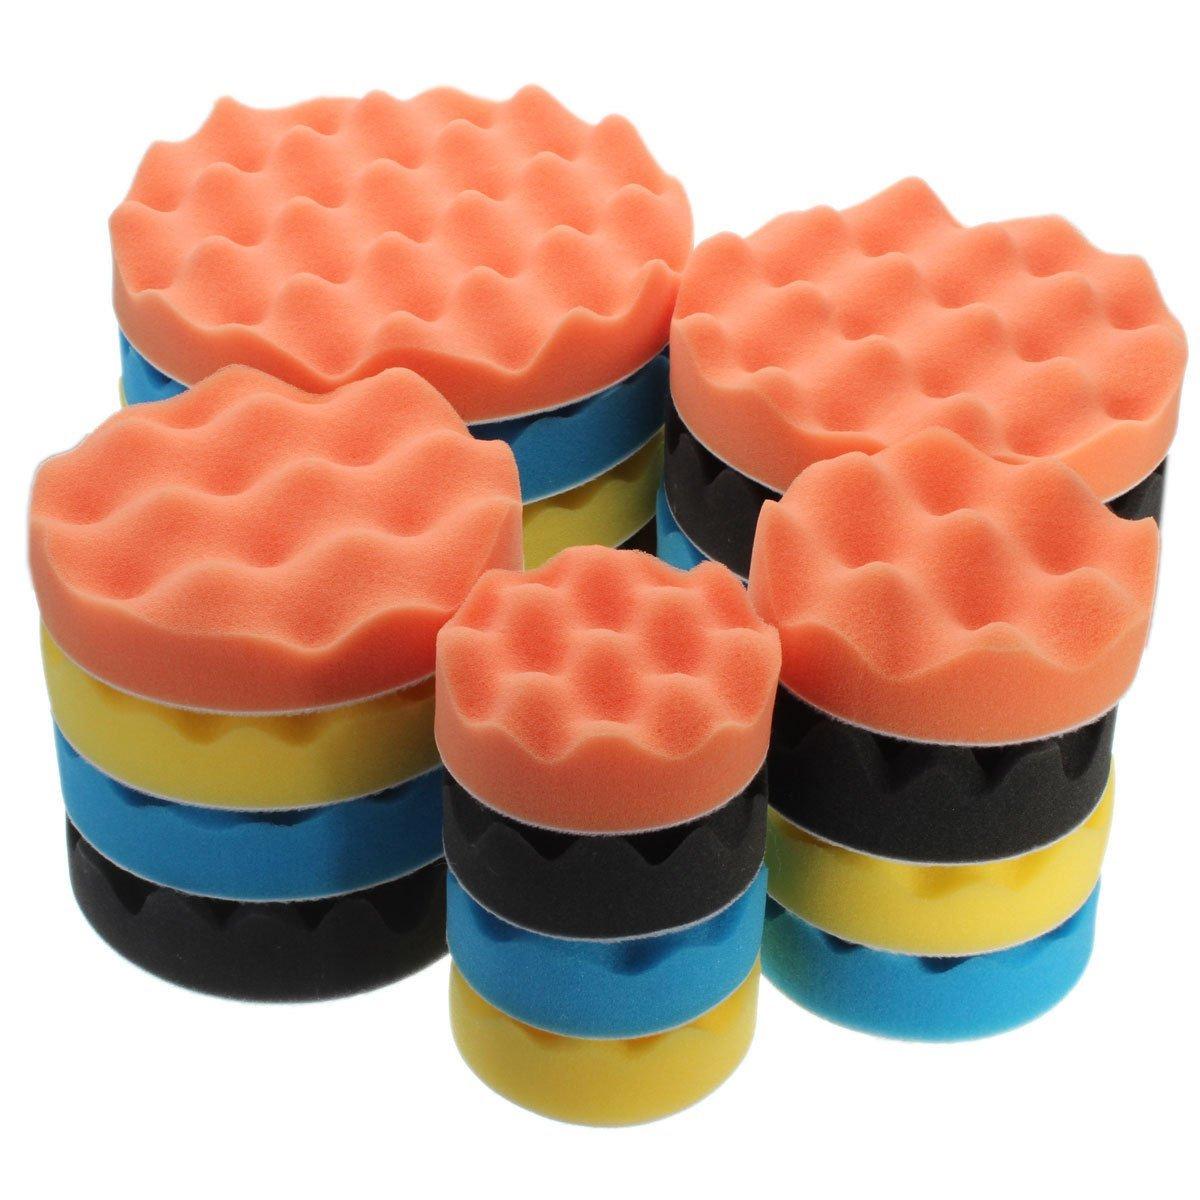 Yosoo 4Pcs 5/6/7' Sponge Polishing Waxing Buffing Pads Kit Set Compound Auto Car Polisher (5 Inch)